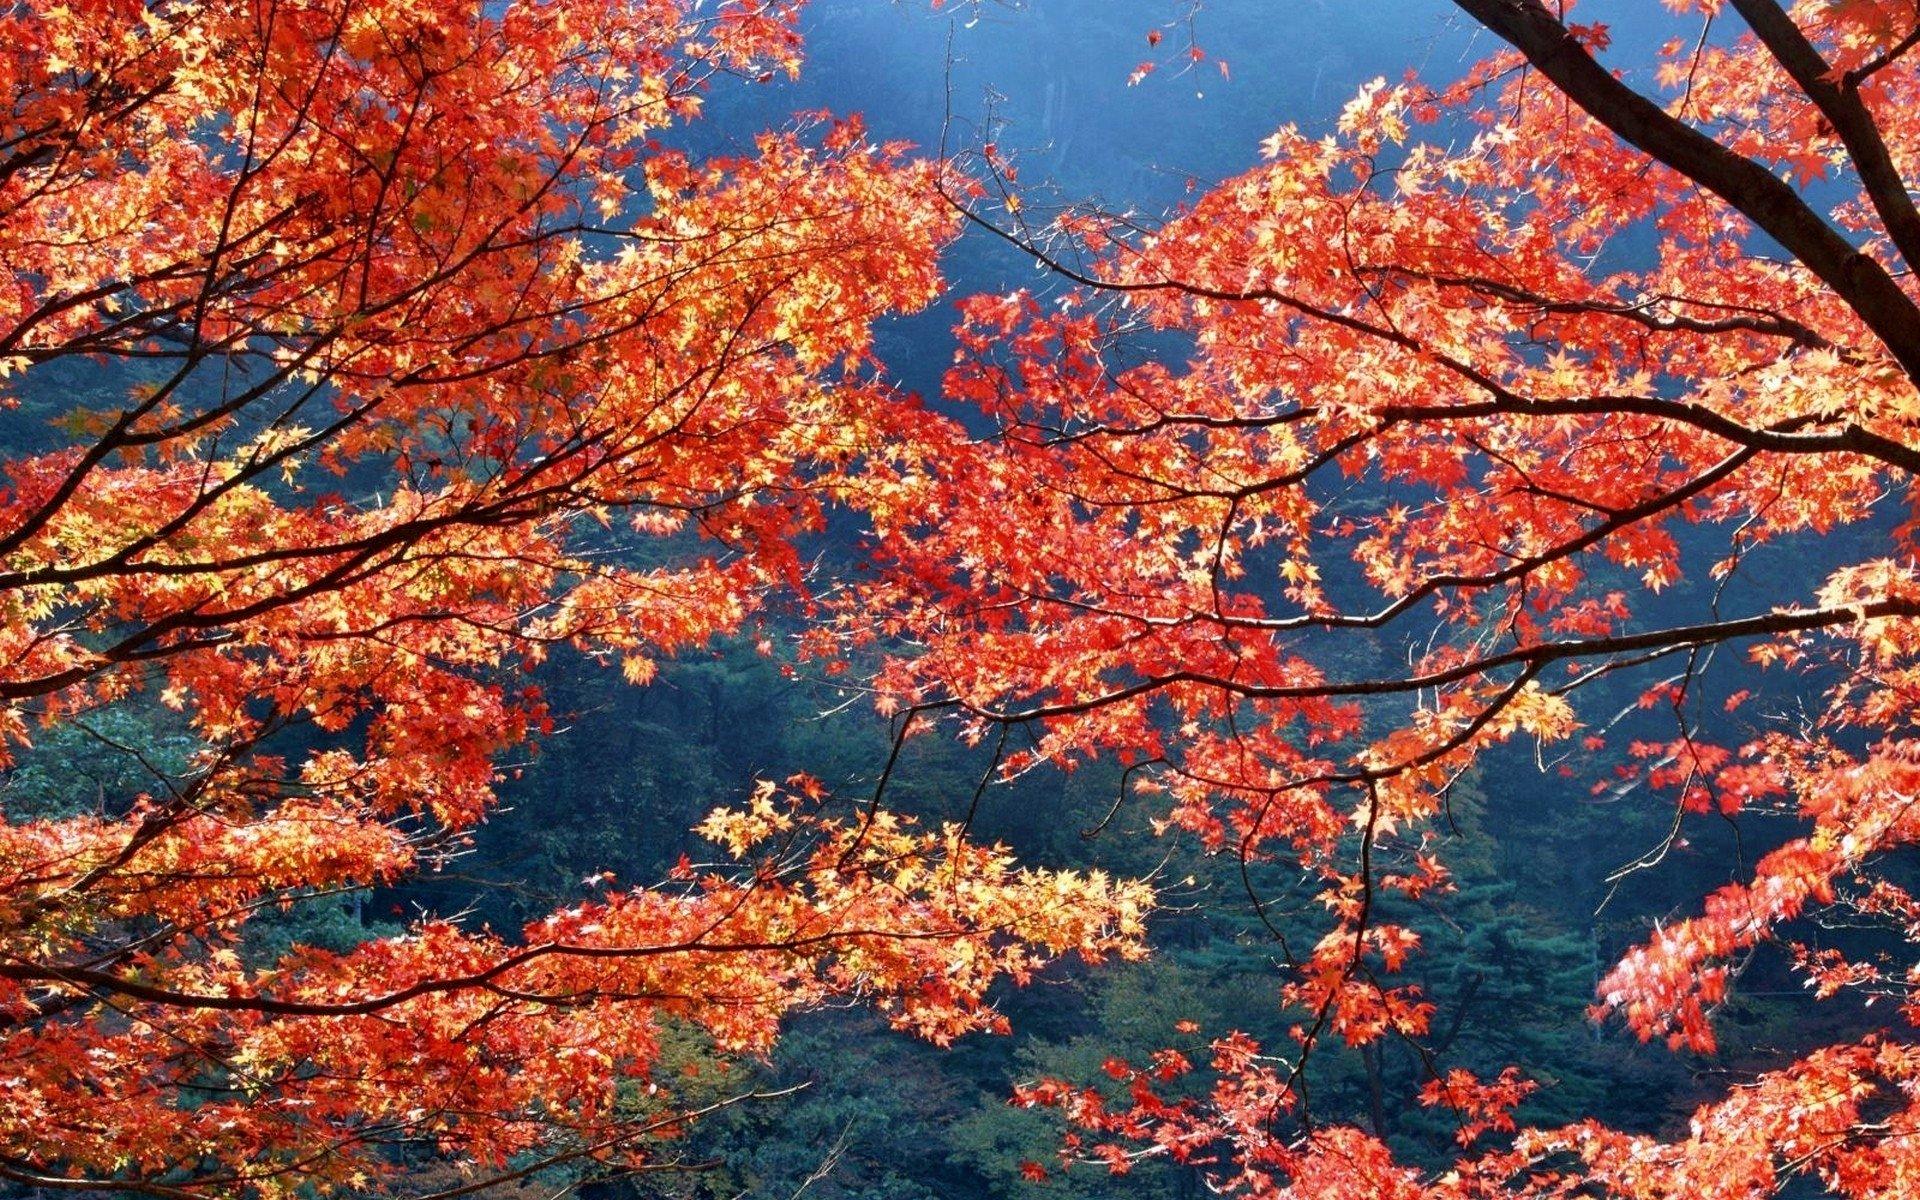 1920x1200 japan autumn season leaves wallpaper 1920x1200 29666 1920x1200